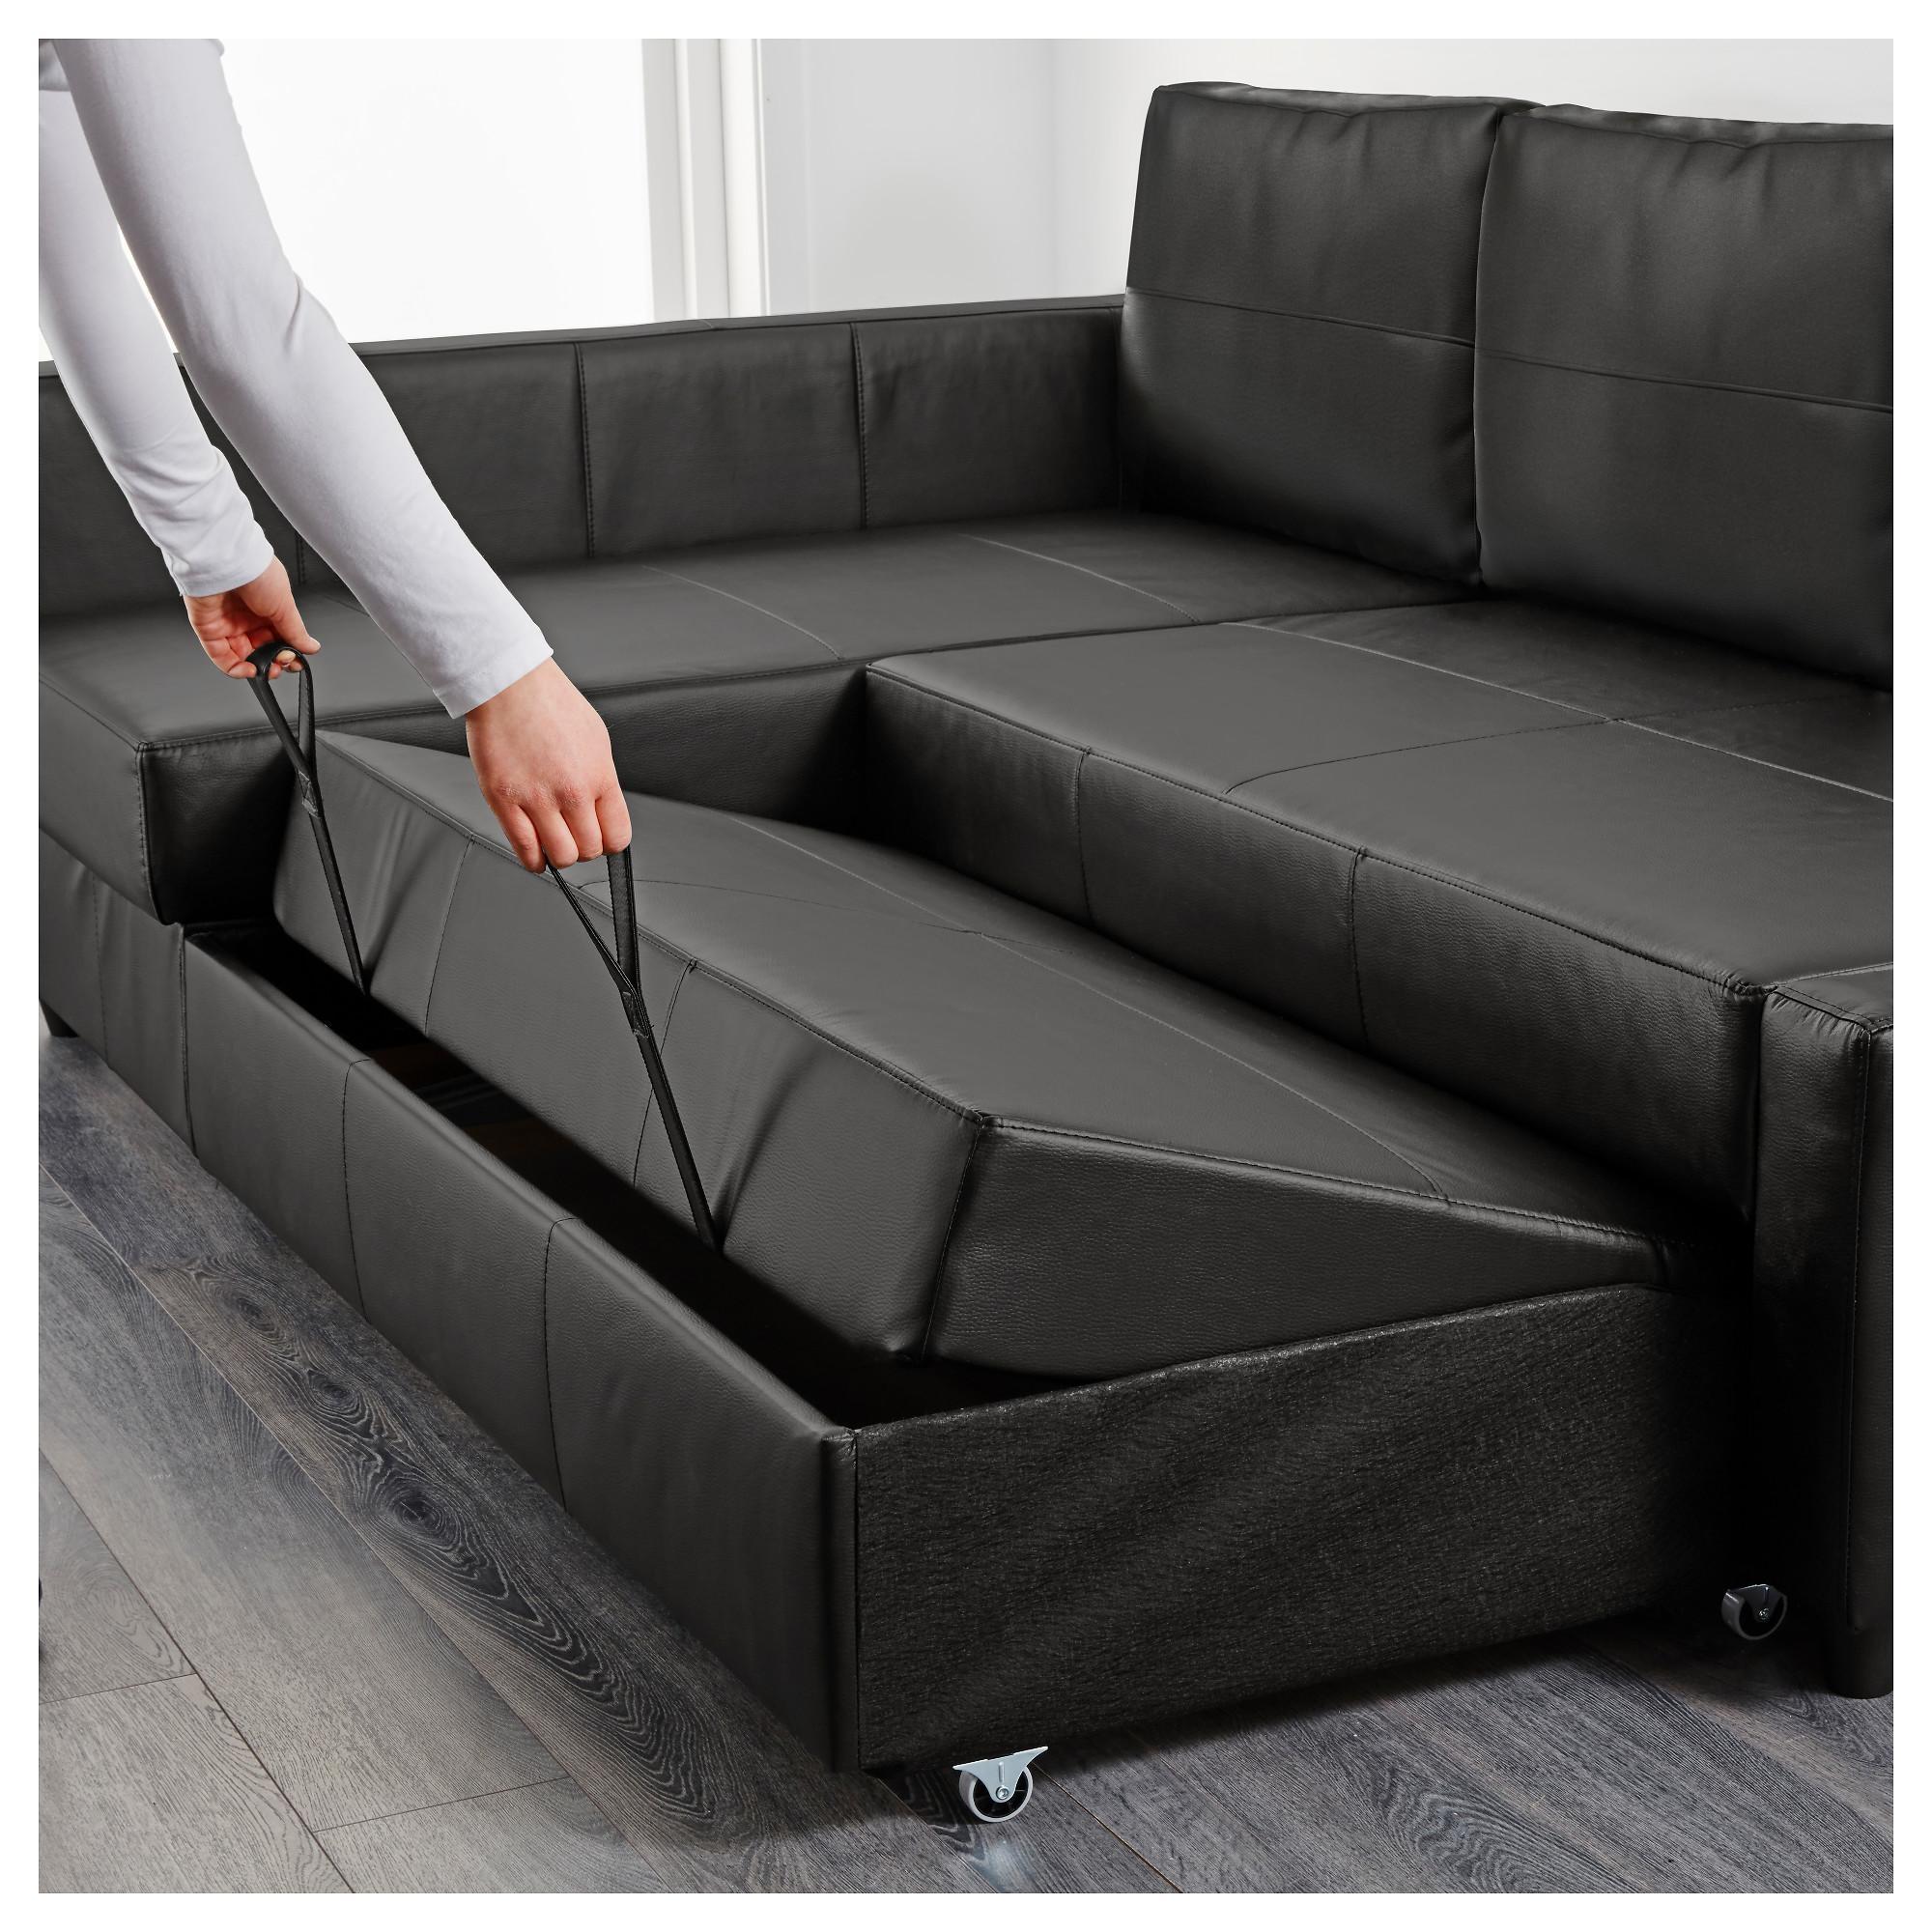 Friheten Sleeper Sectional,3 Seat W/storage – Skiftebo Dark Gray For Storage Sofas Ikea (View 10 of 20)